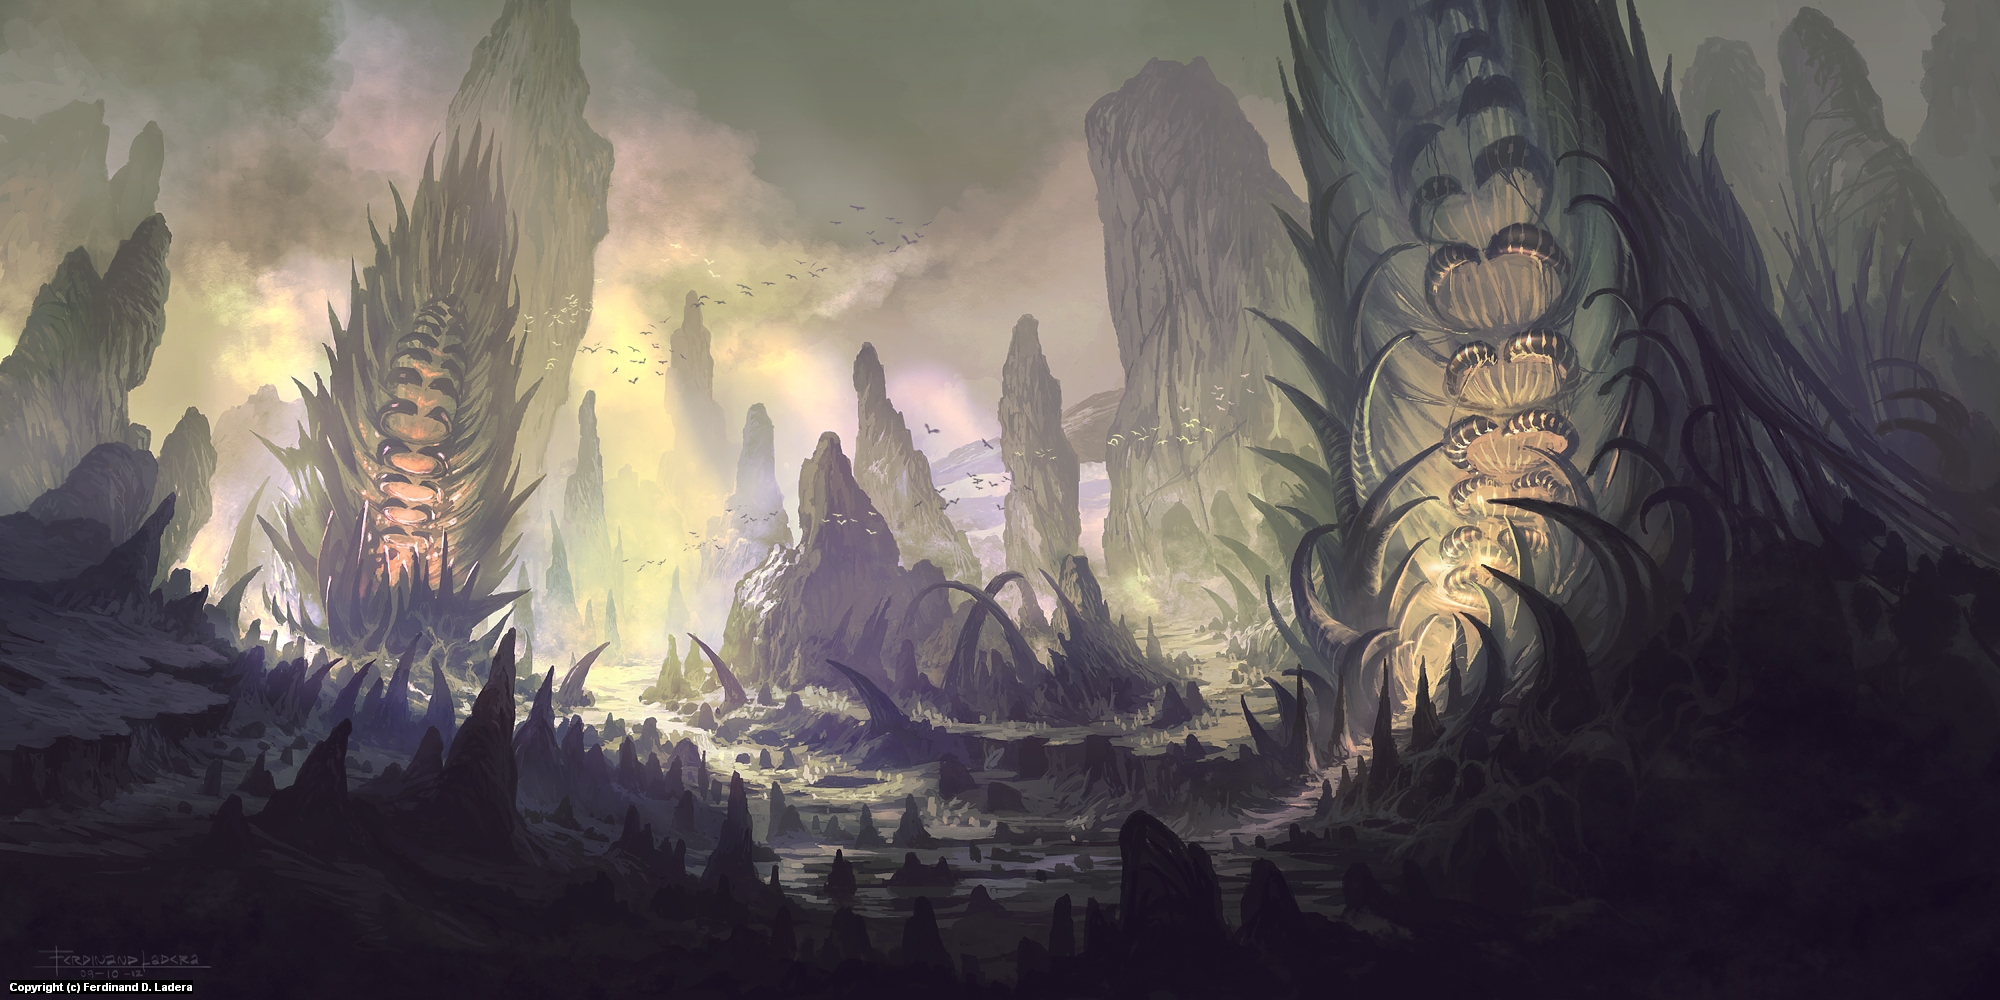 Mt. Ightmor Artwork by Ferdinand Ladera